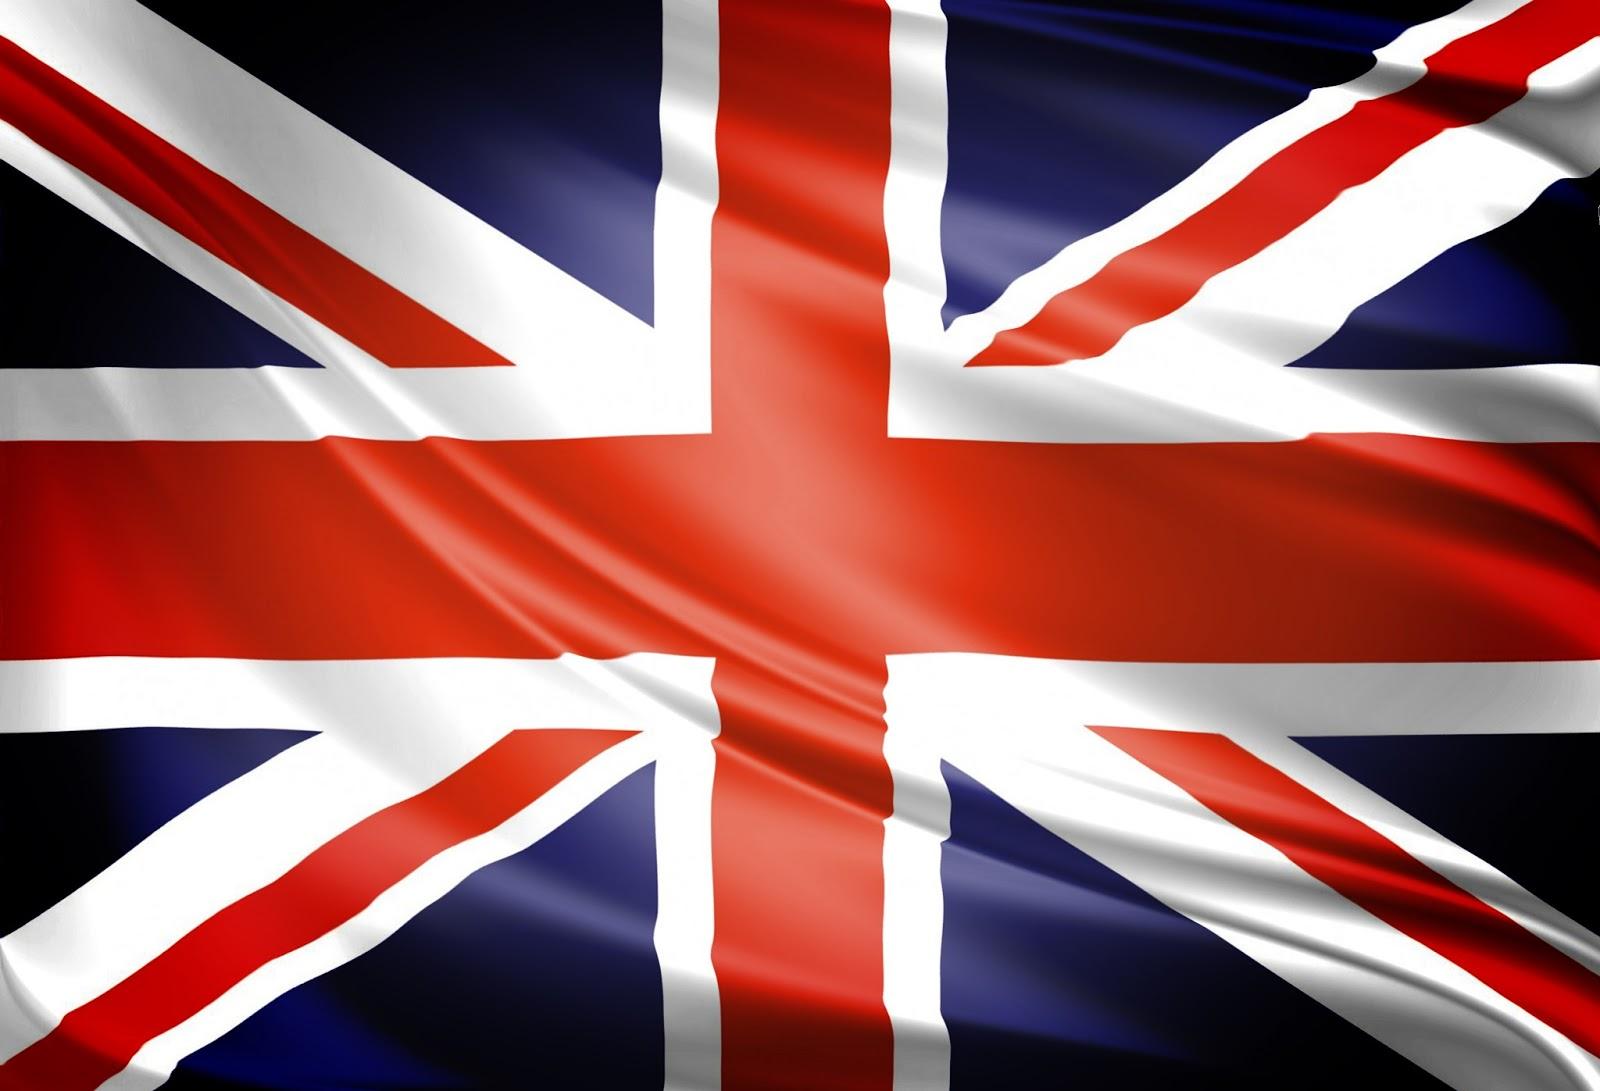 english flag wallpaper - photo #25